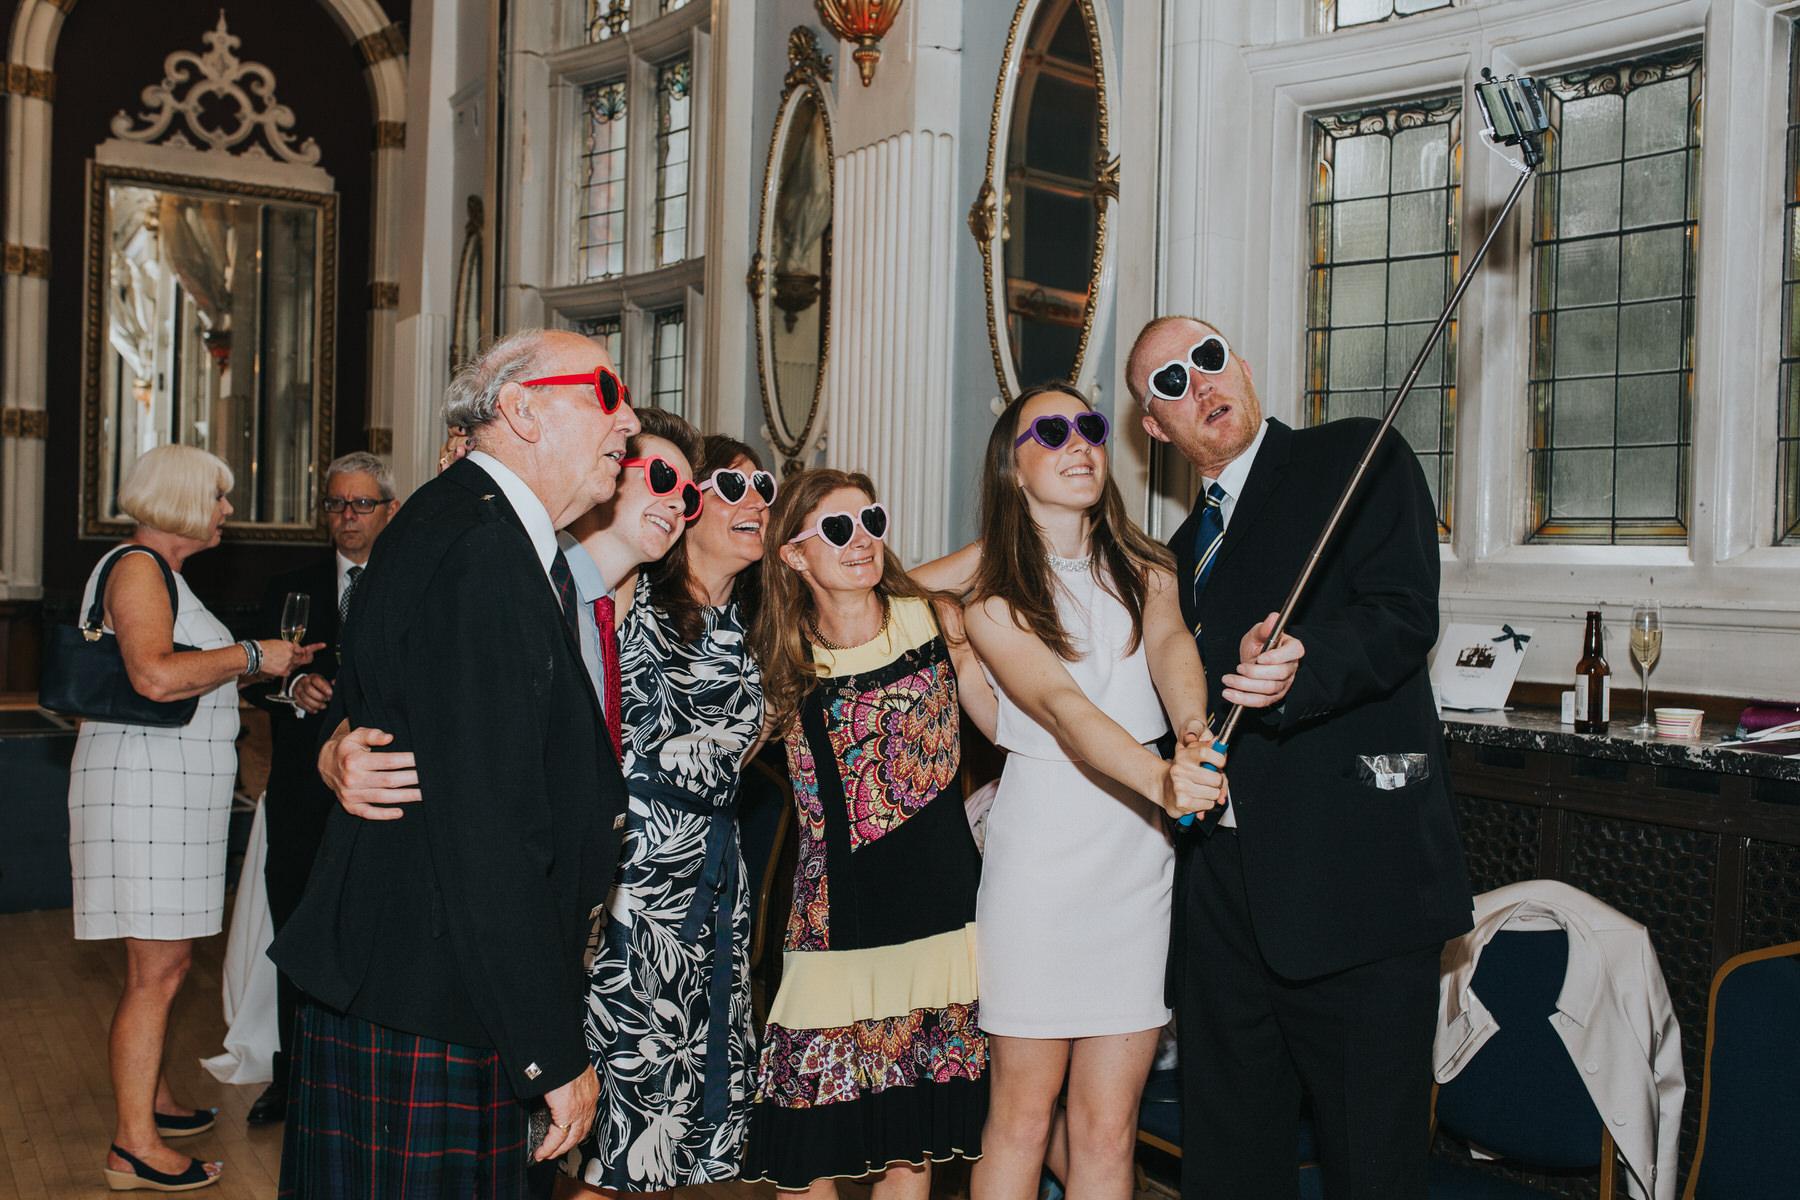 262 Islington wedding guests selfie stick.jpg